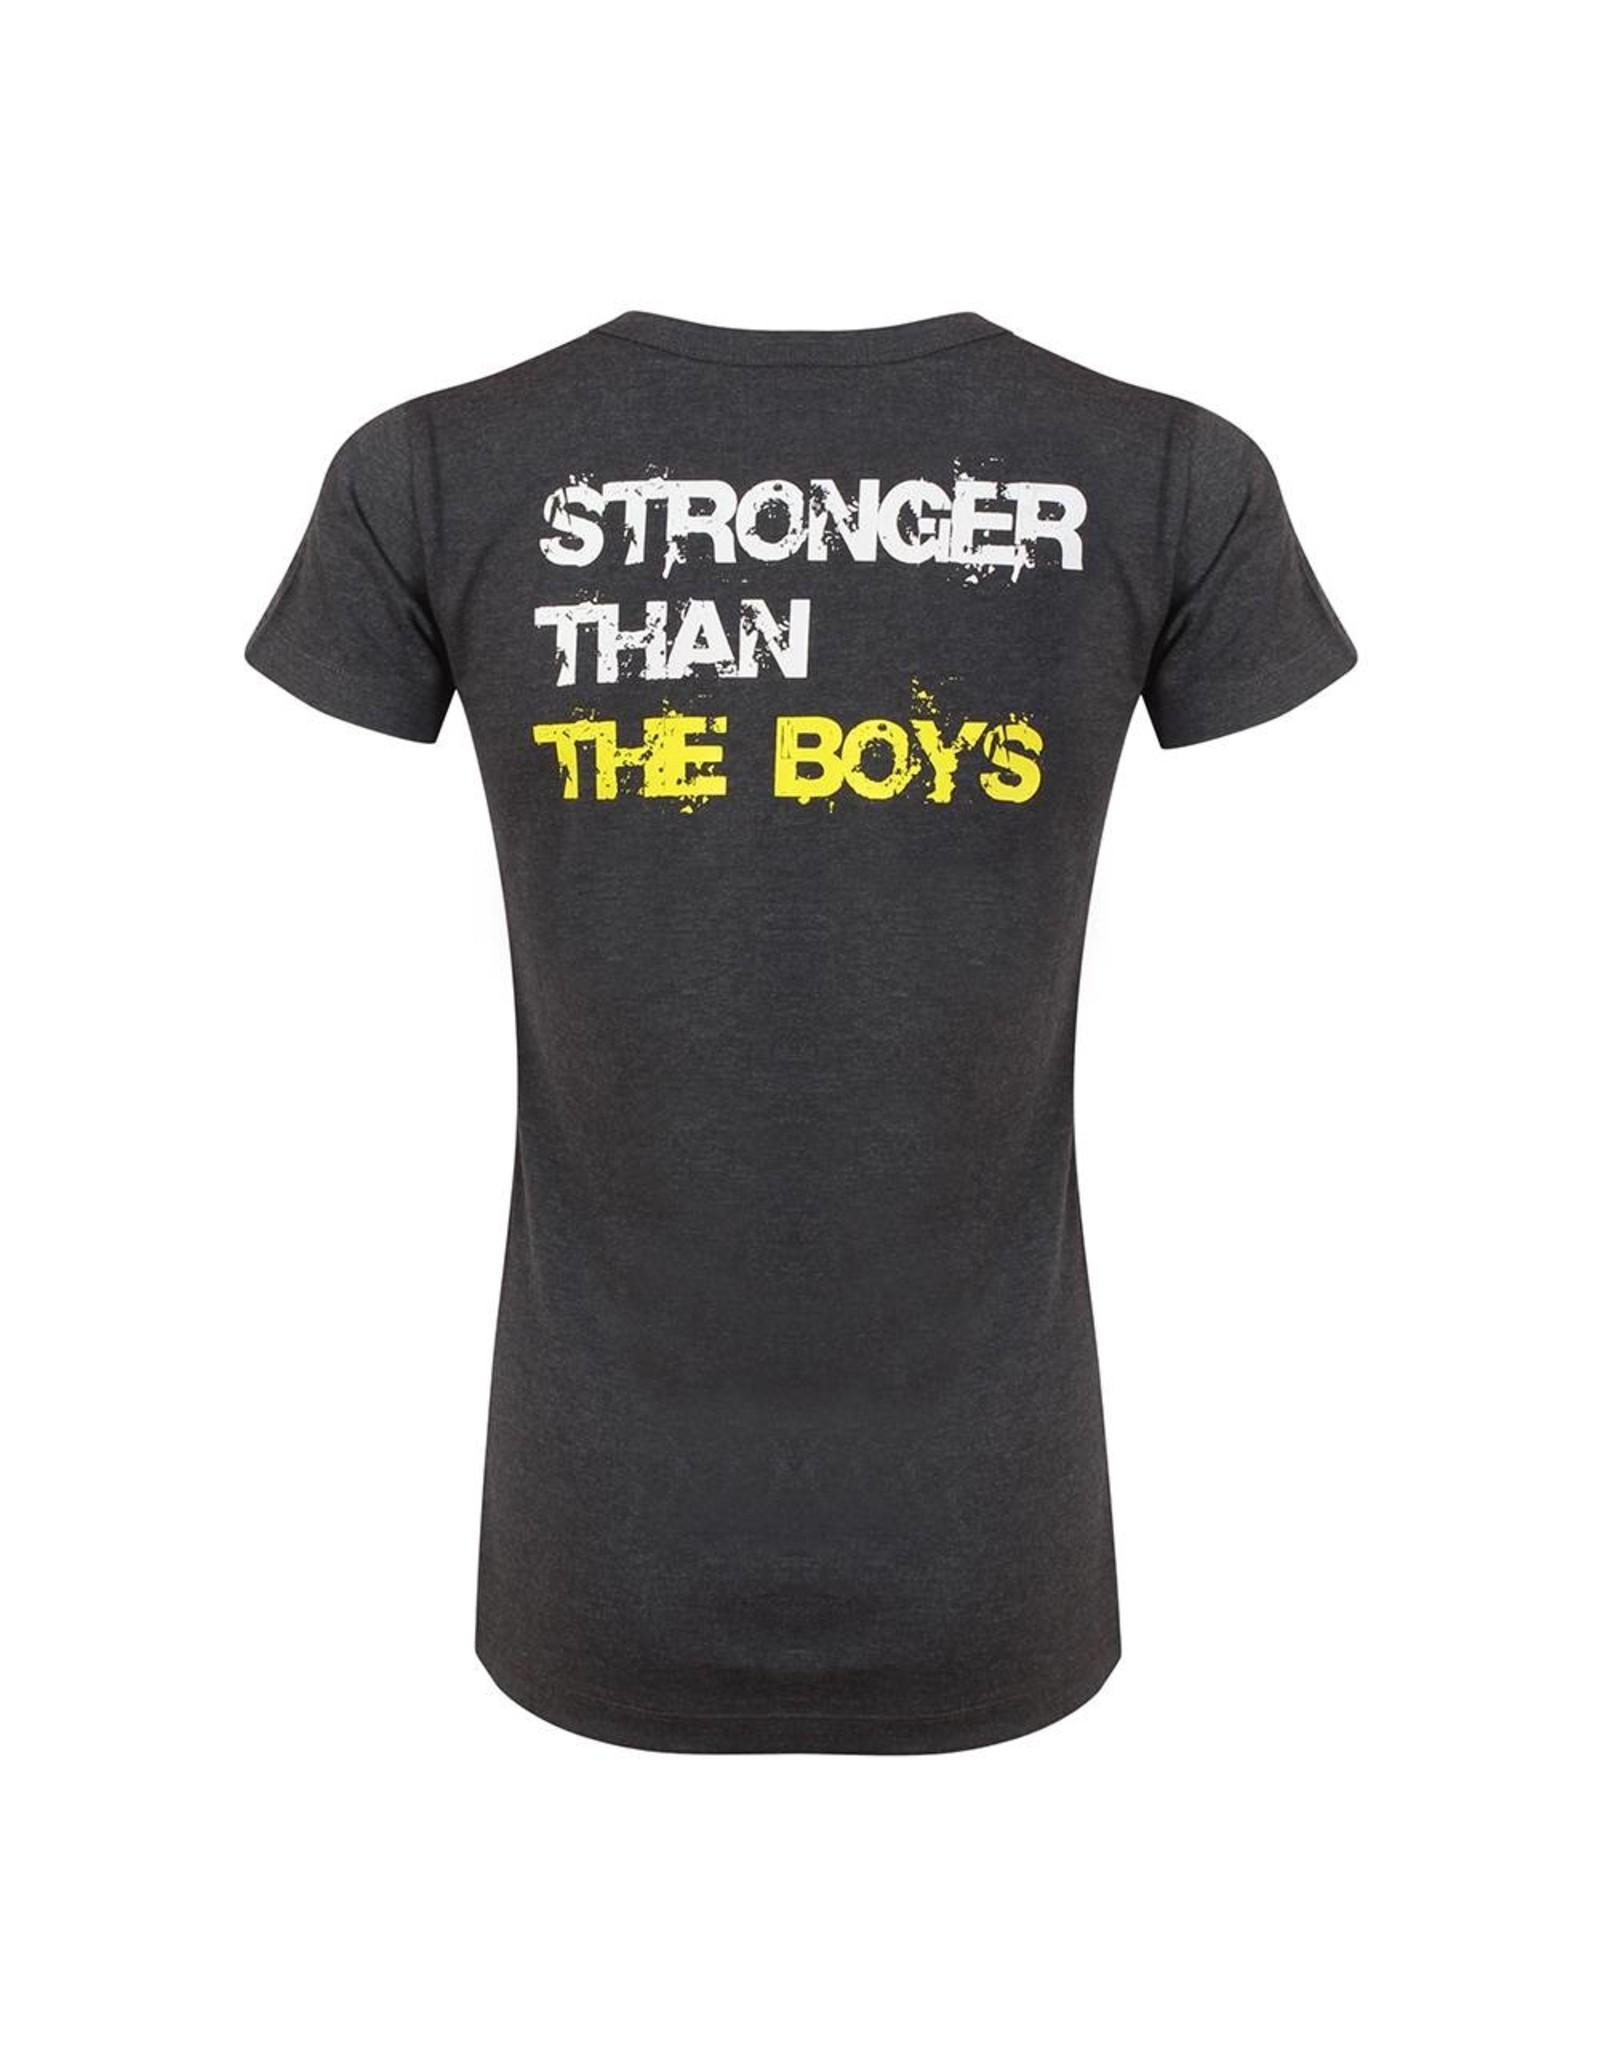 Gold's Gym Slogan T-shirt Stronger Than The Boys - Grey